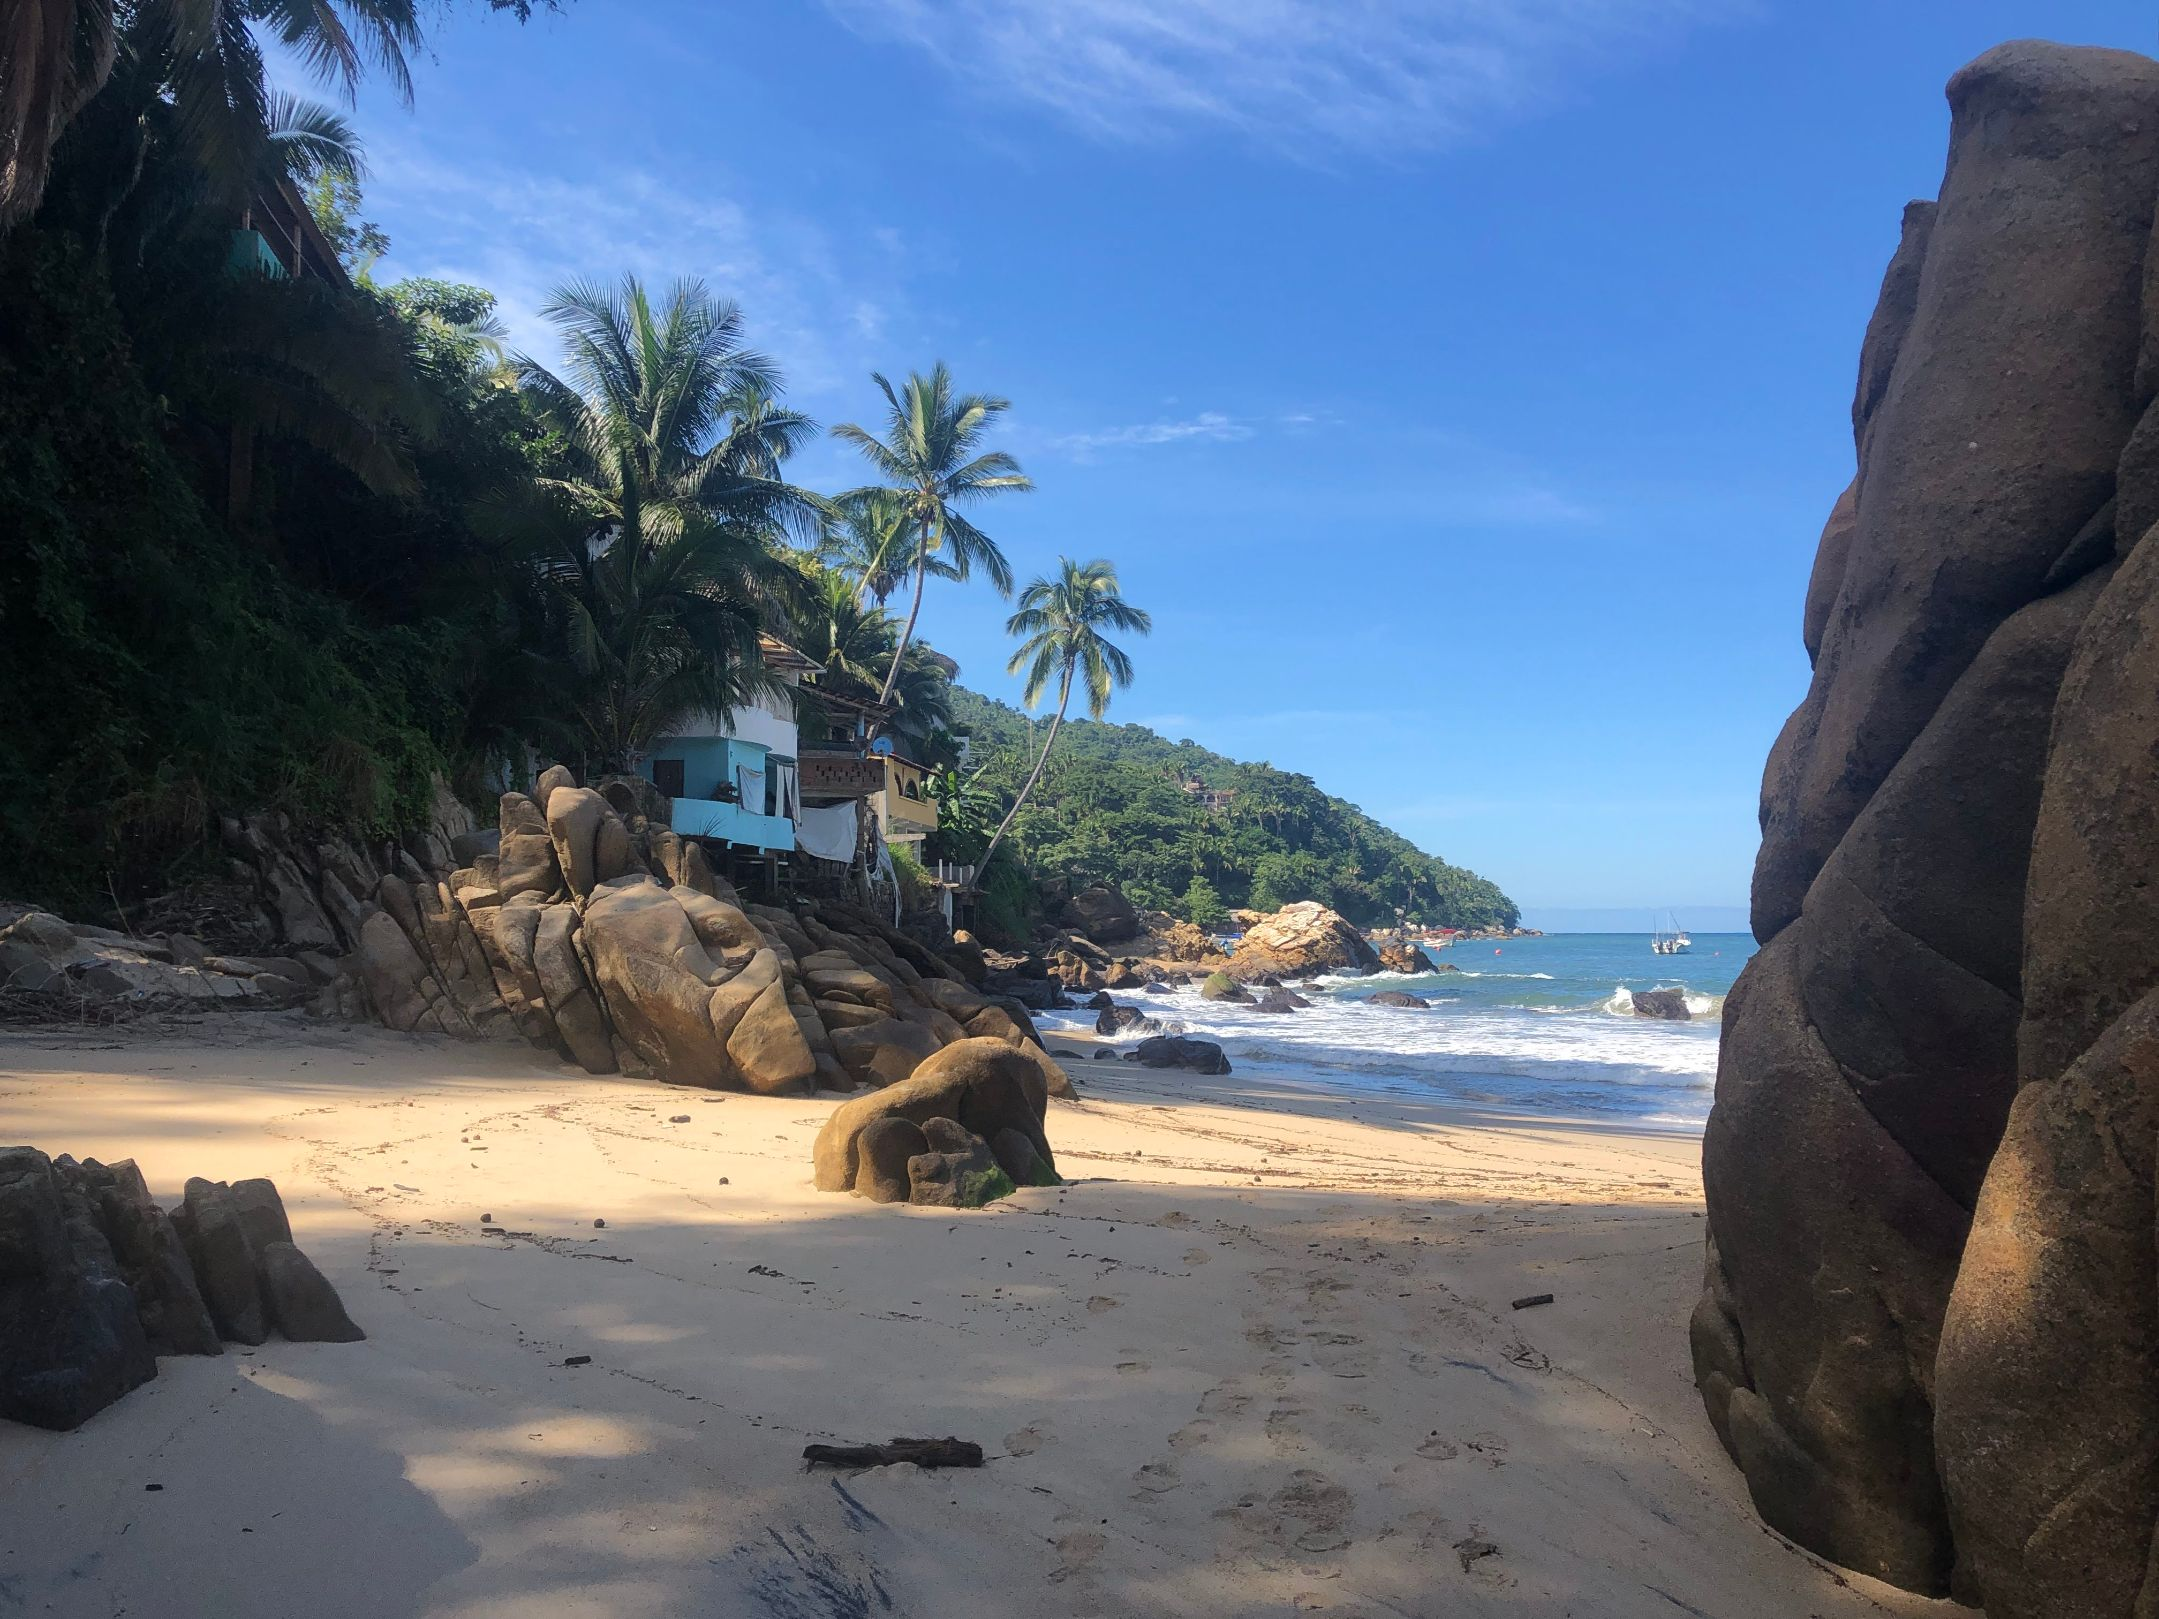 house, rocks, and palm trees on Yelapa beach